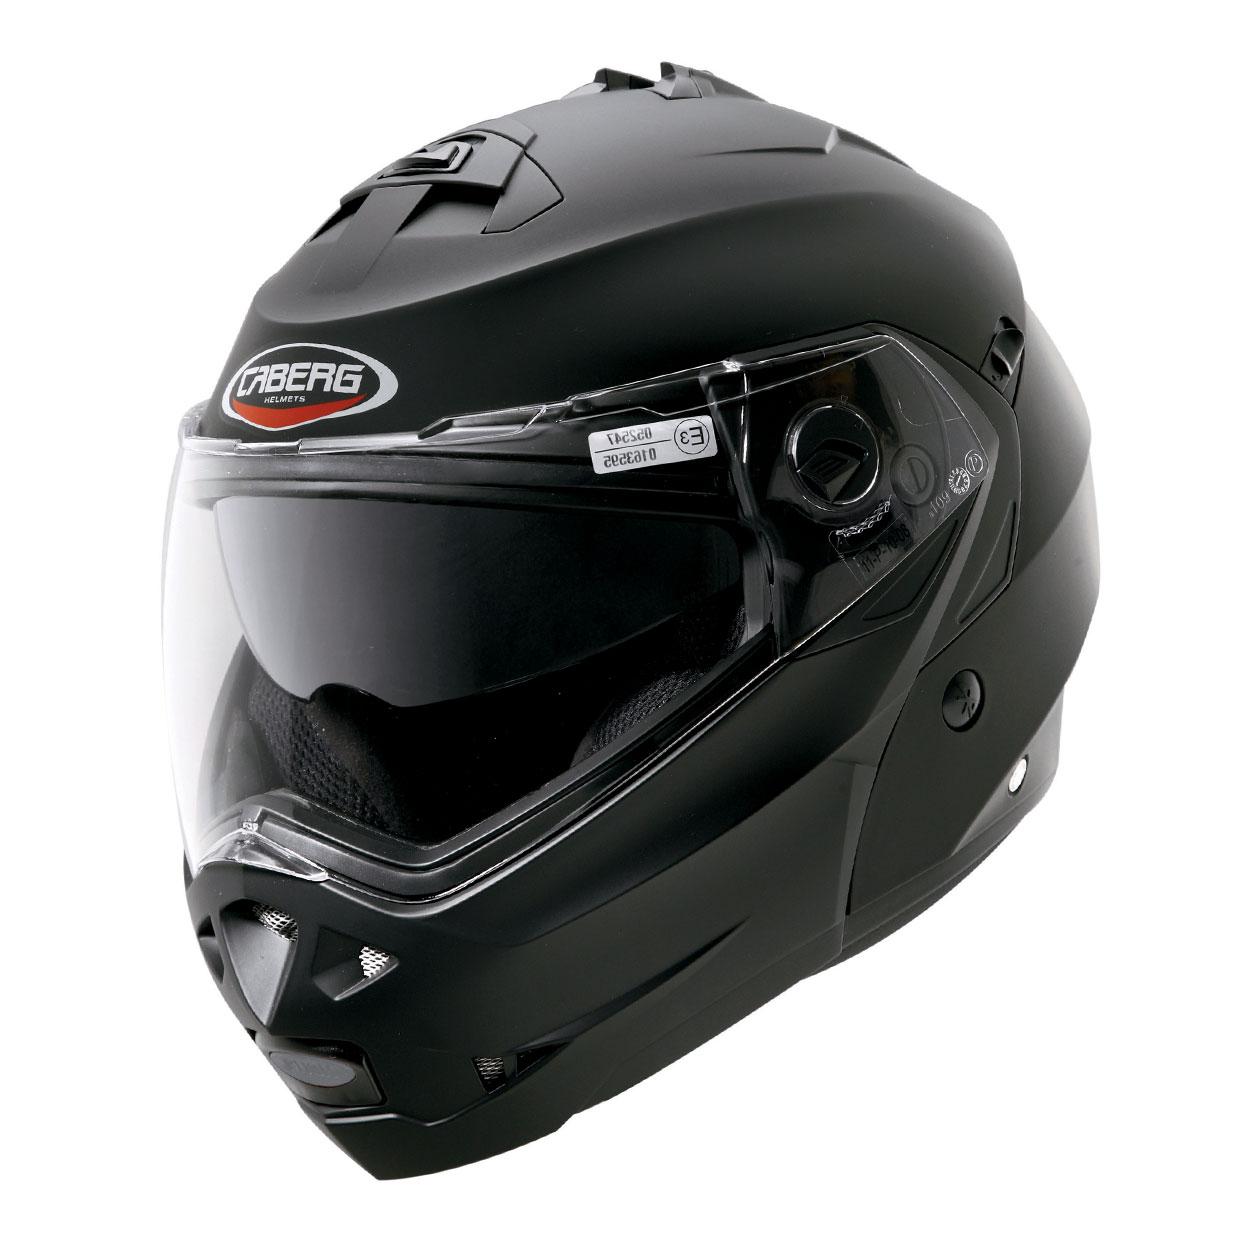 Ducati Helmets For Sale Australia